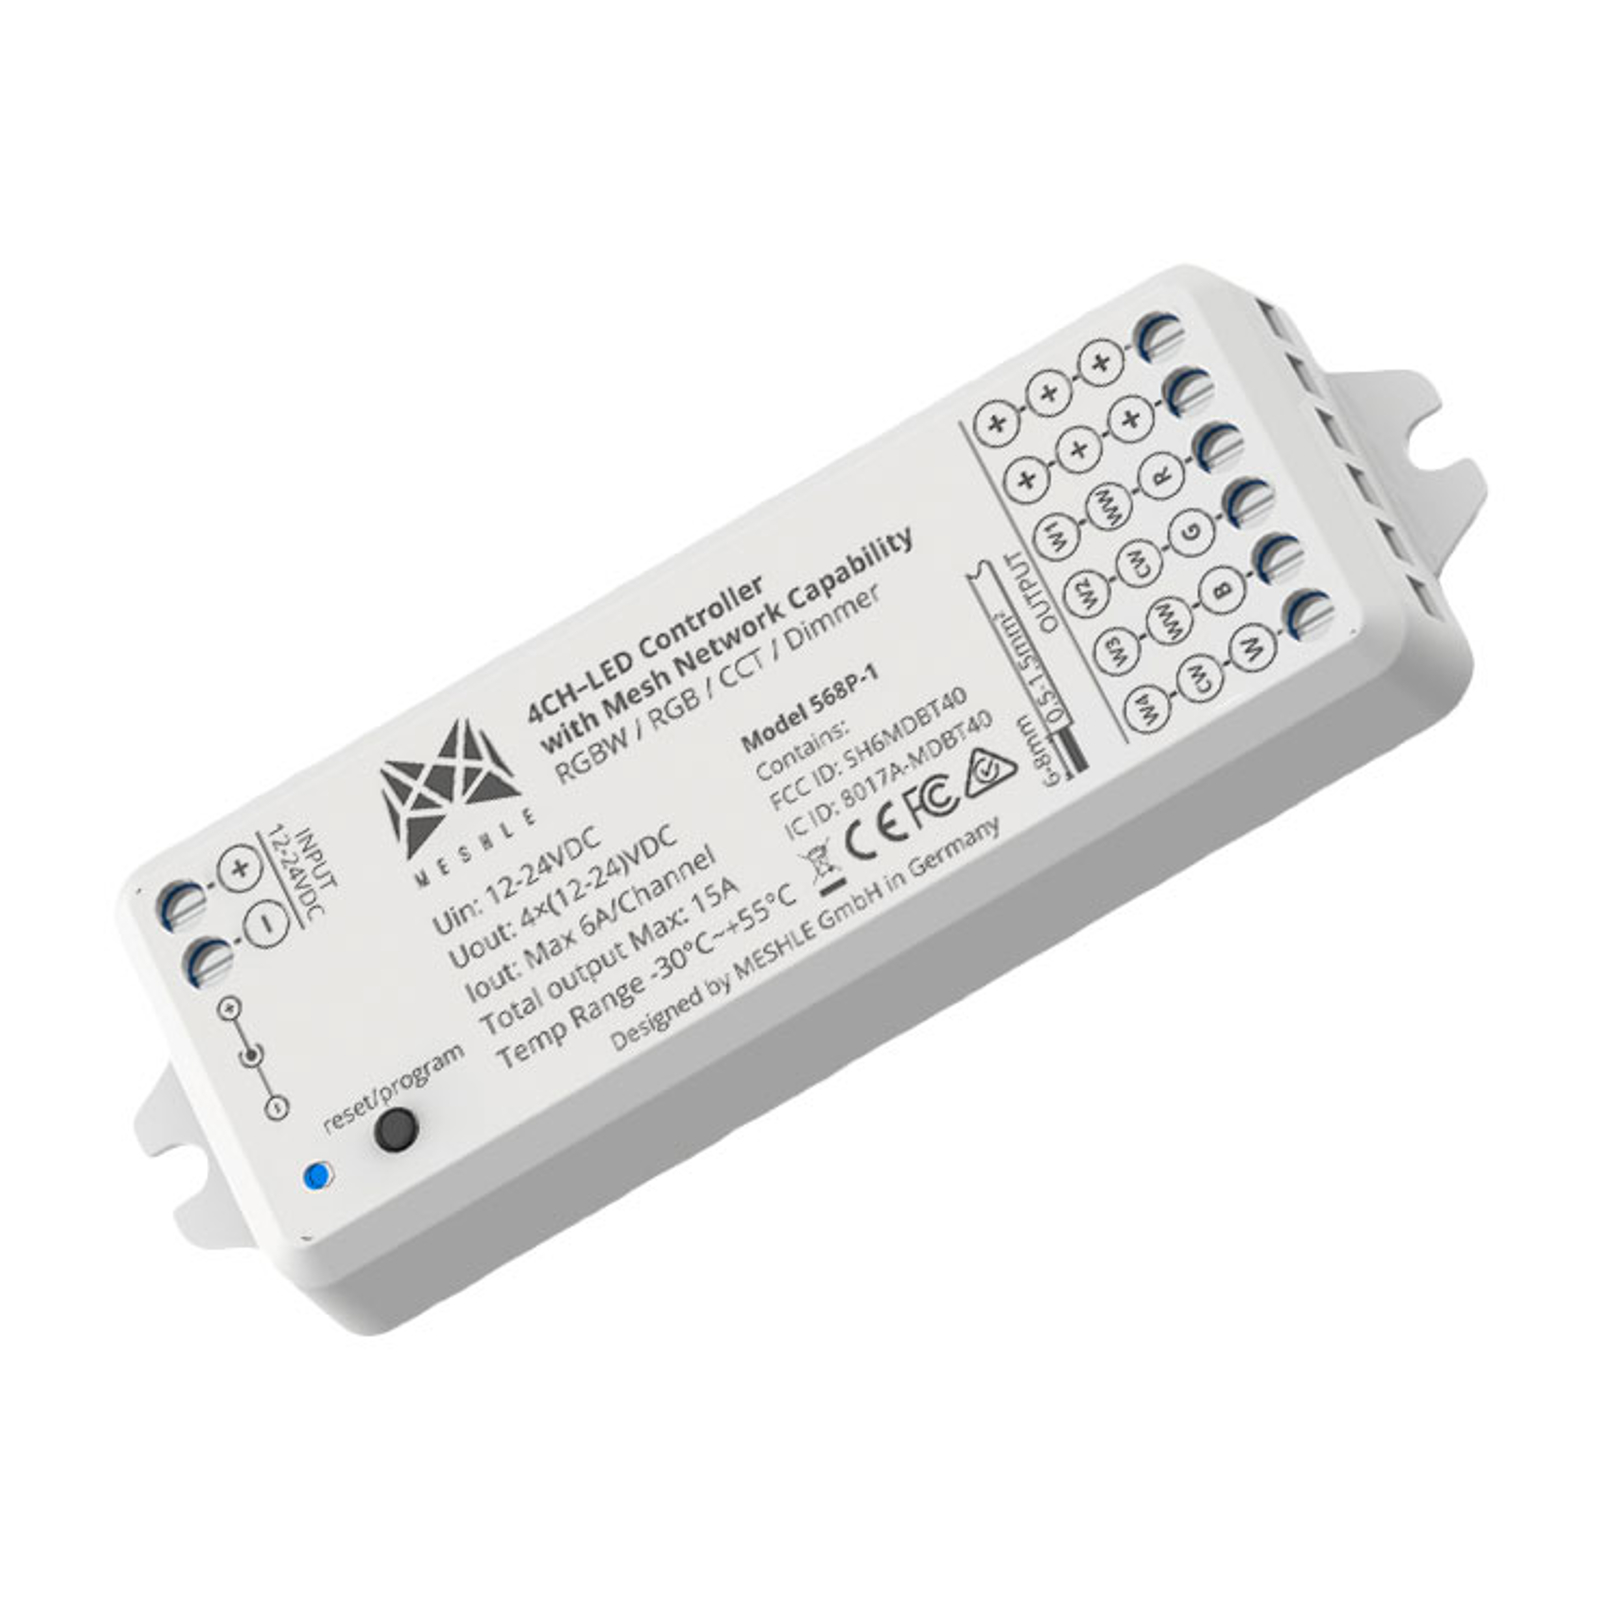 EHMANN T86.74 Flex Pro dimmer Bluetooth